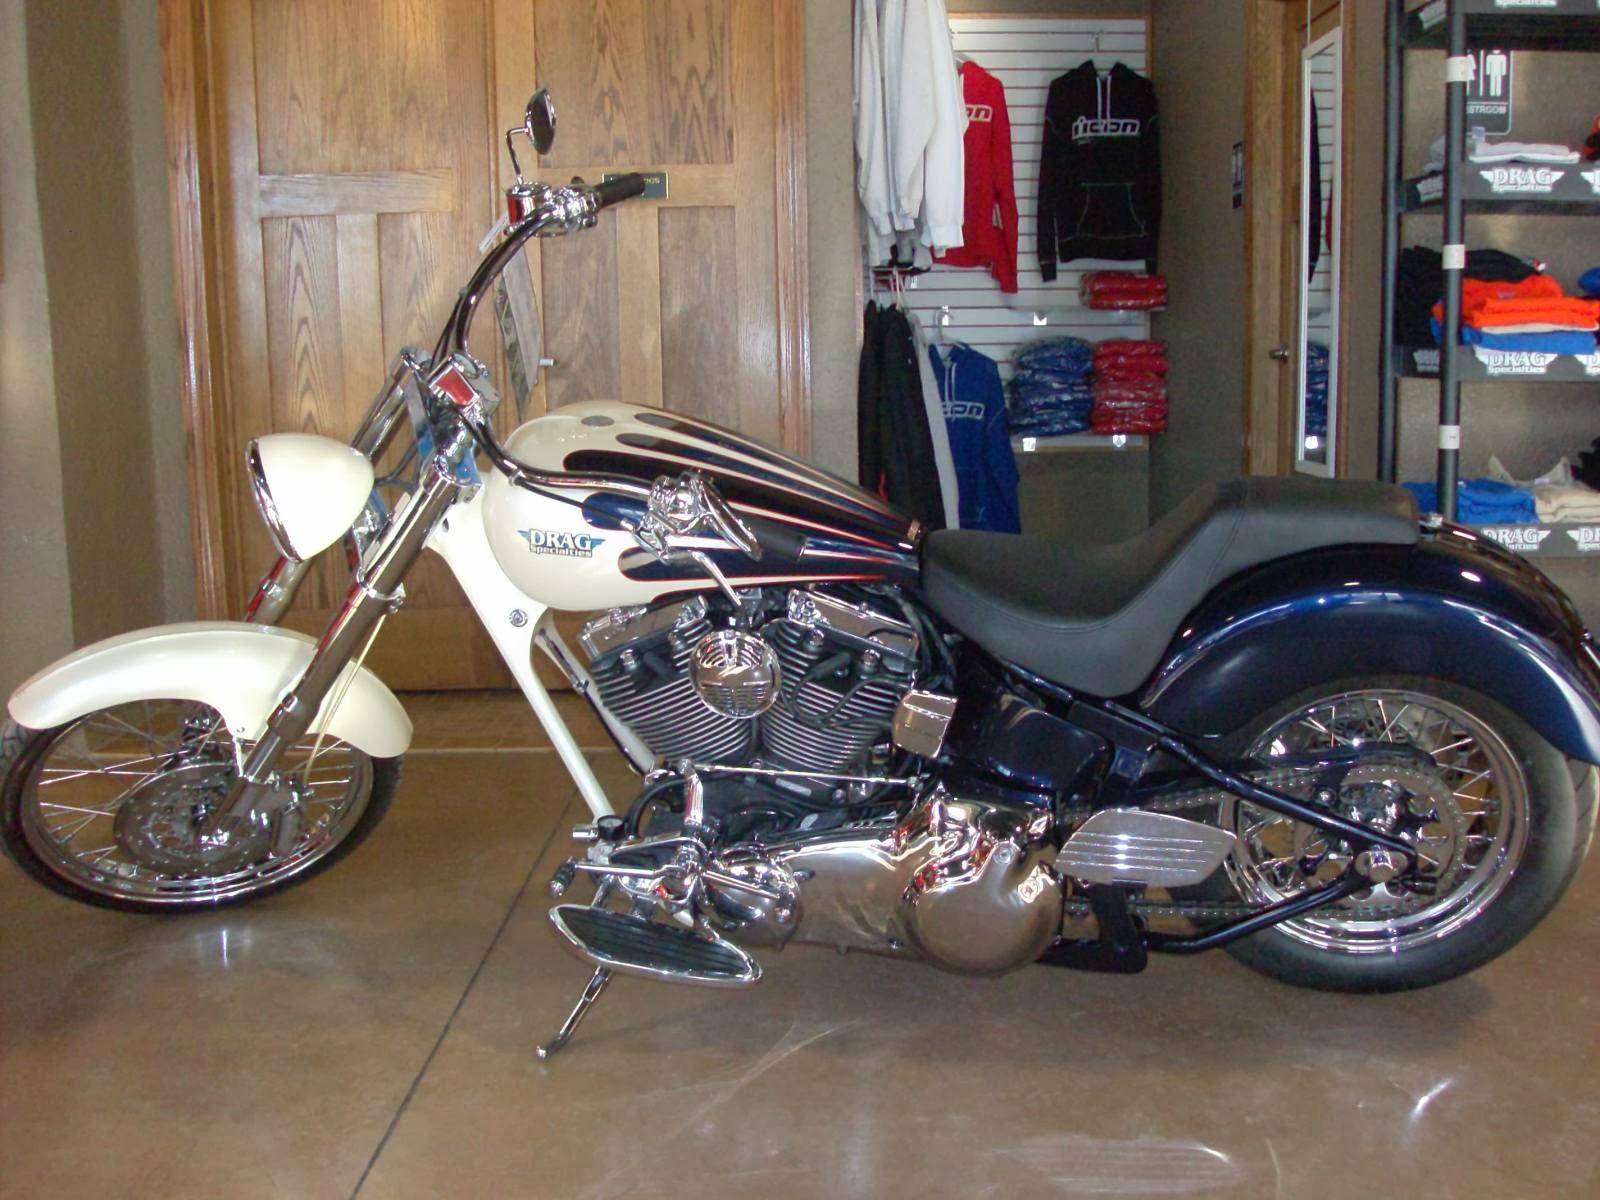 TT Motorcycles, Bikes For Sale